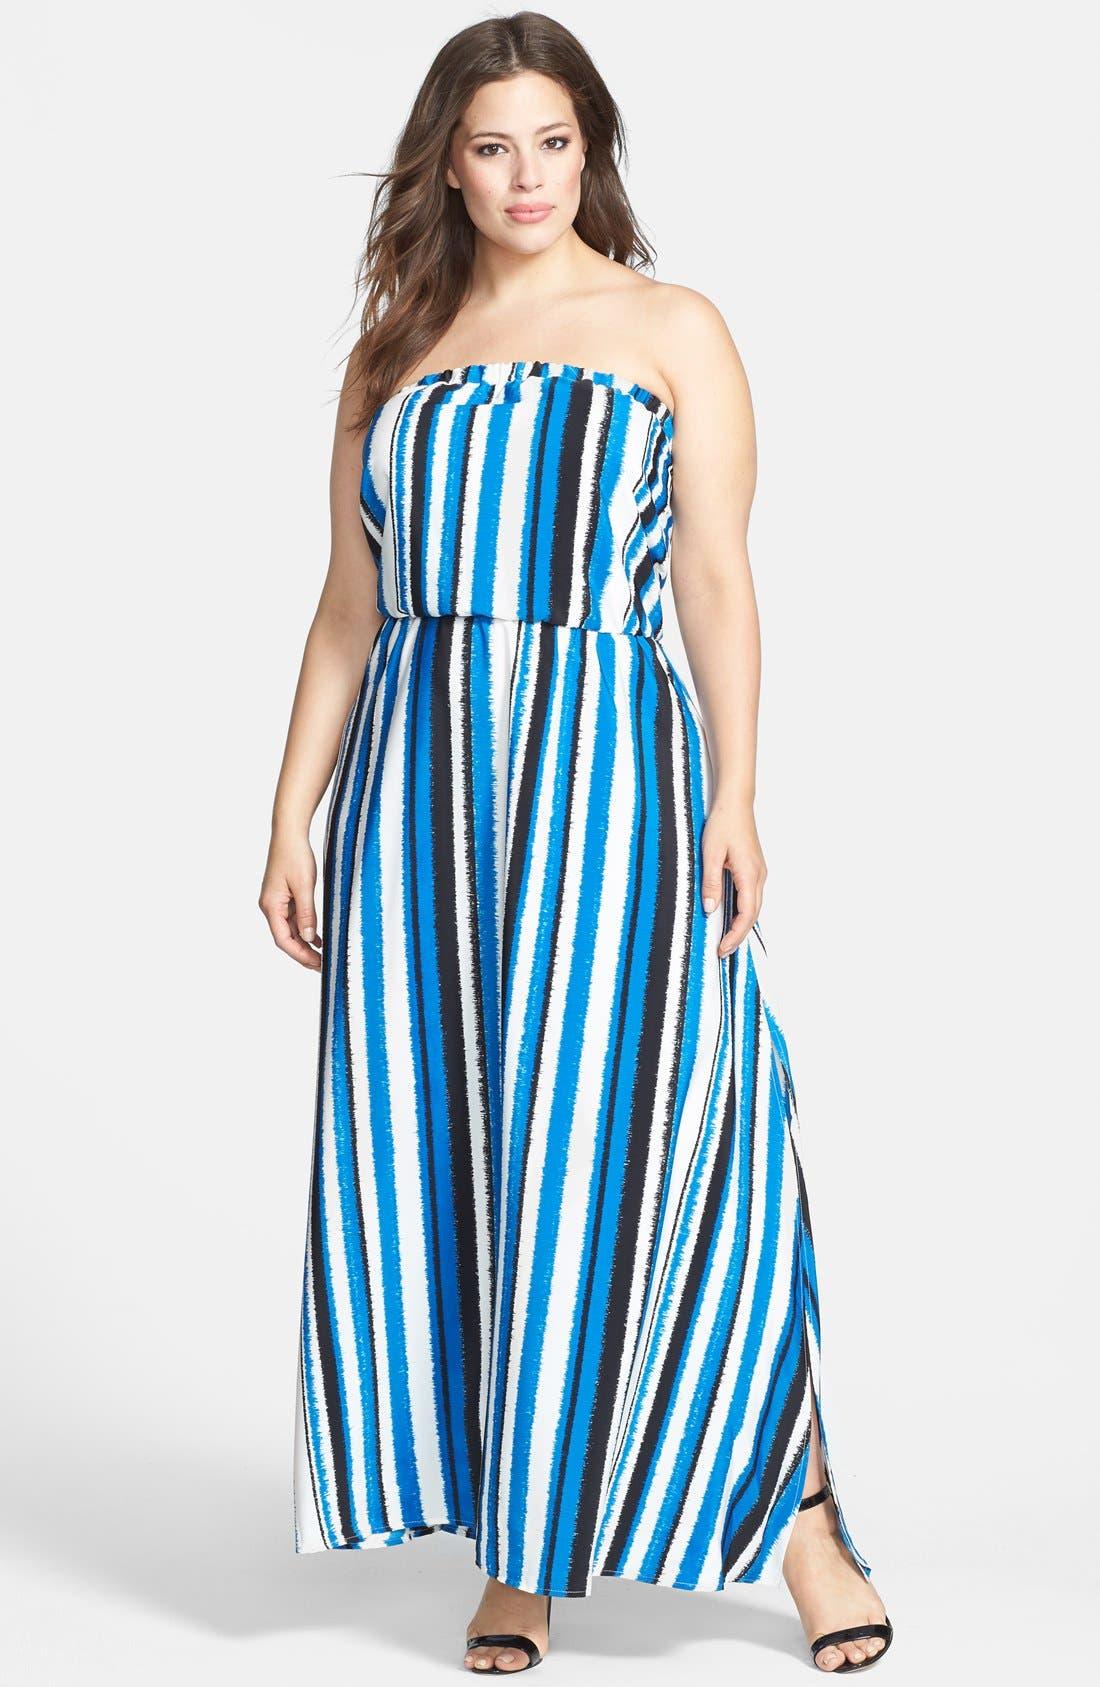 Alternate Image 1 Selected - BB Dakota 'Zaida' Strapless Maxi Dress (Plus Size)